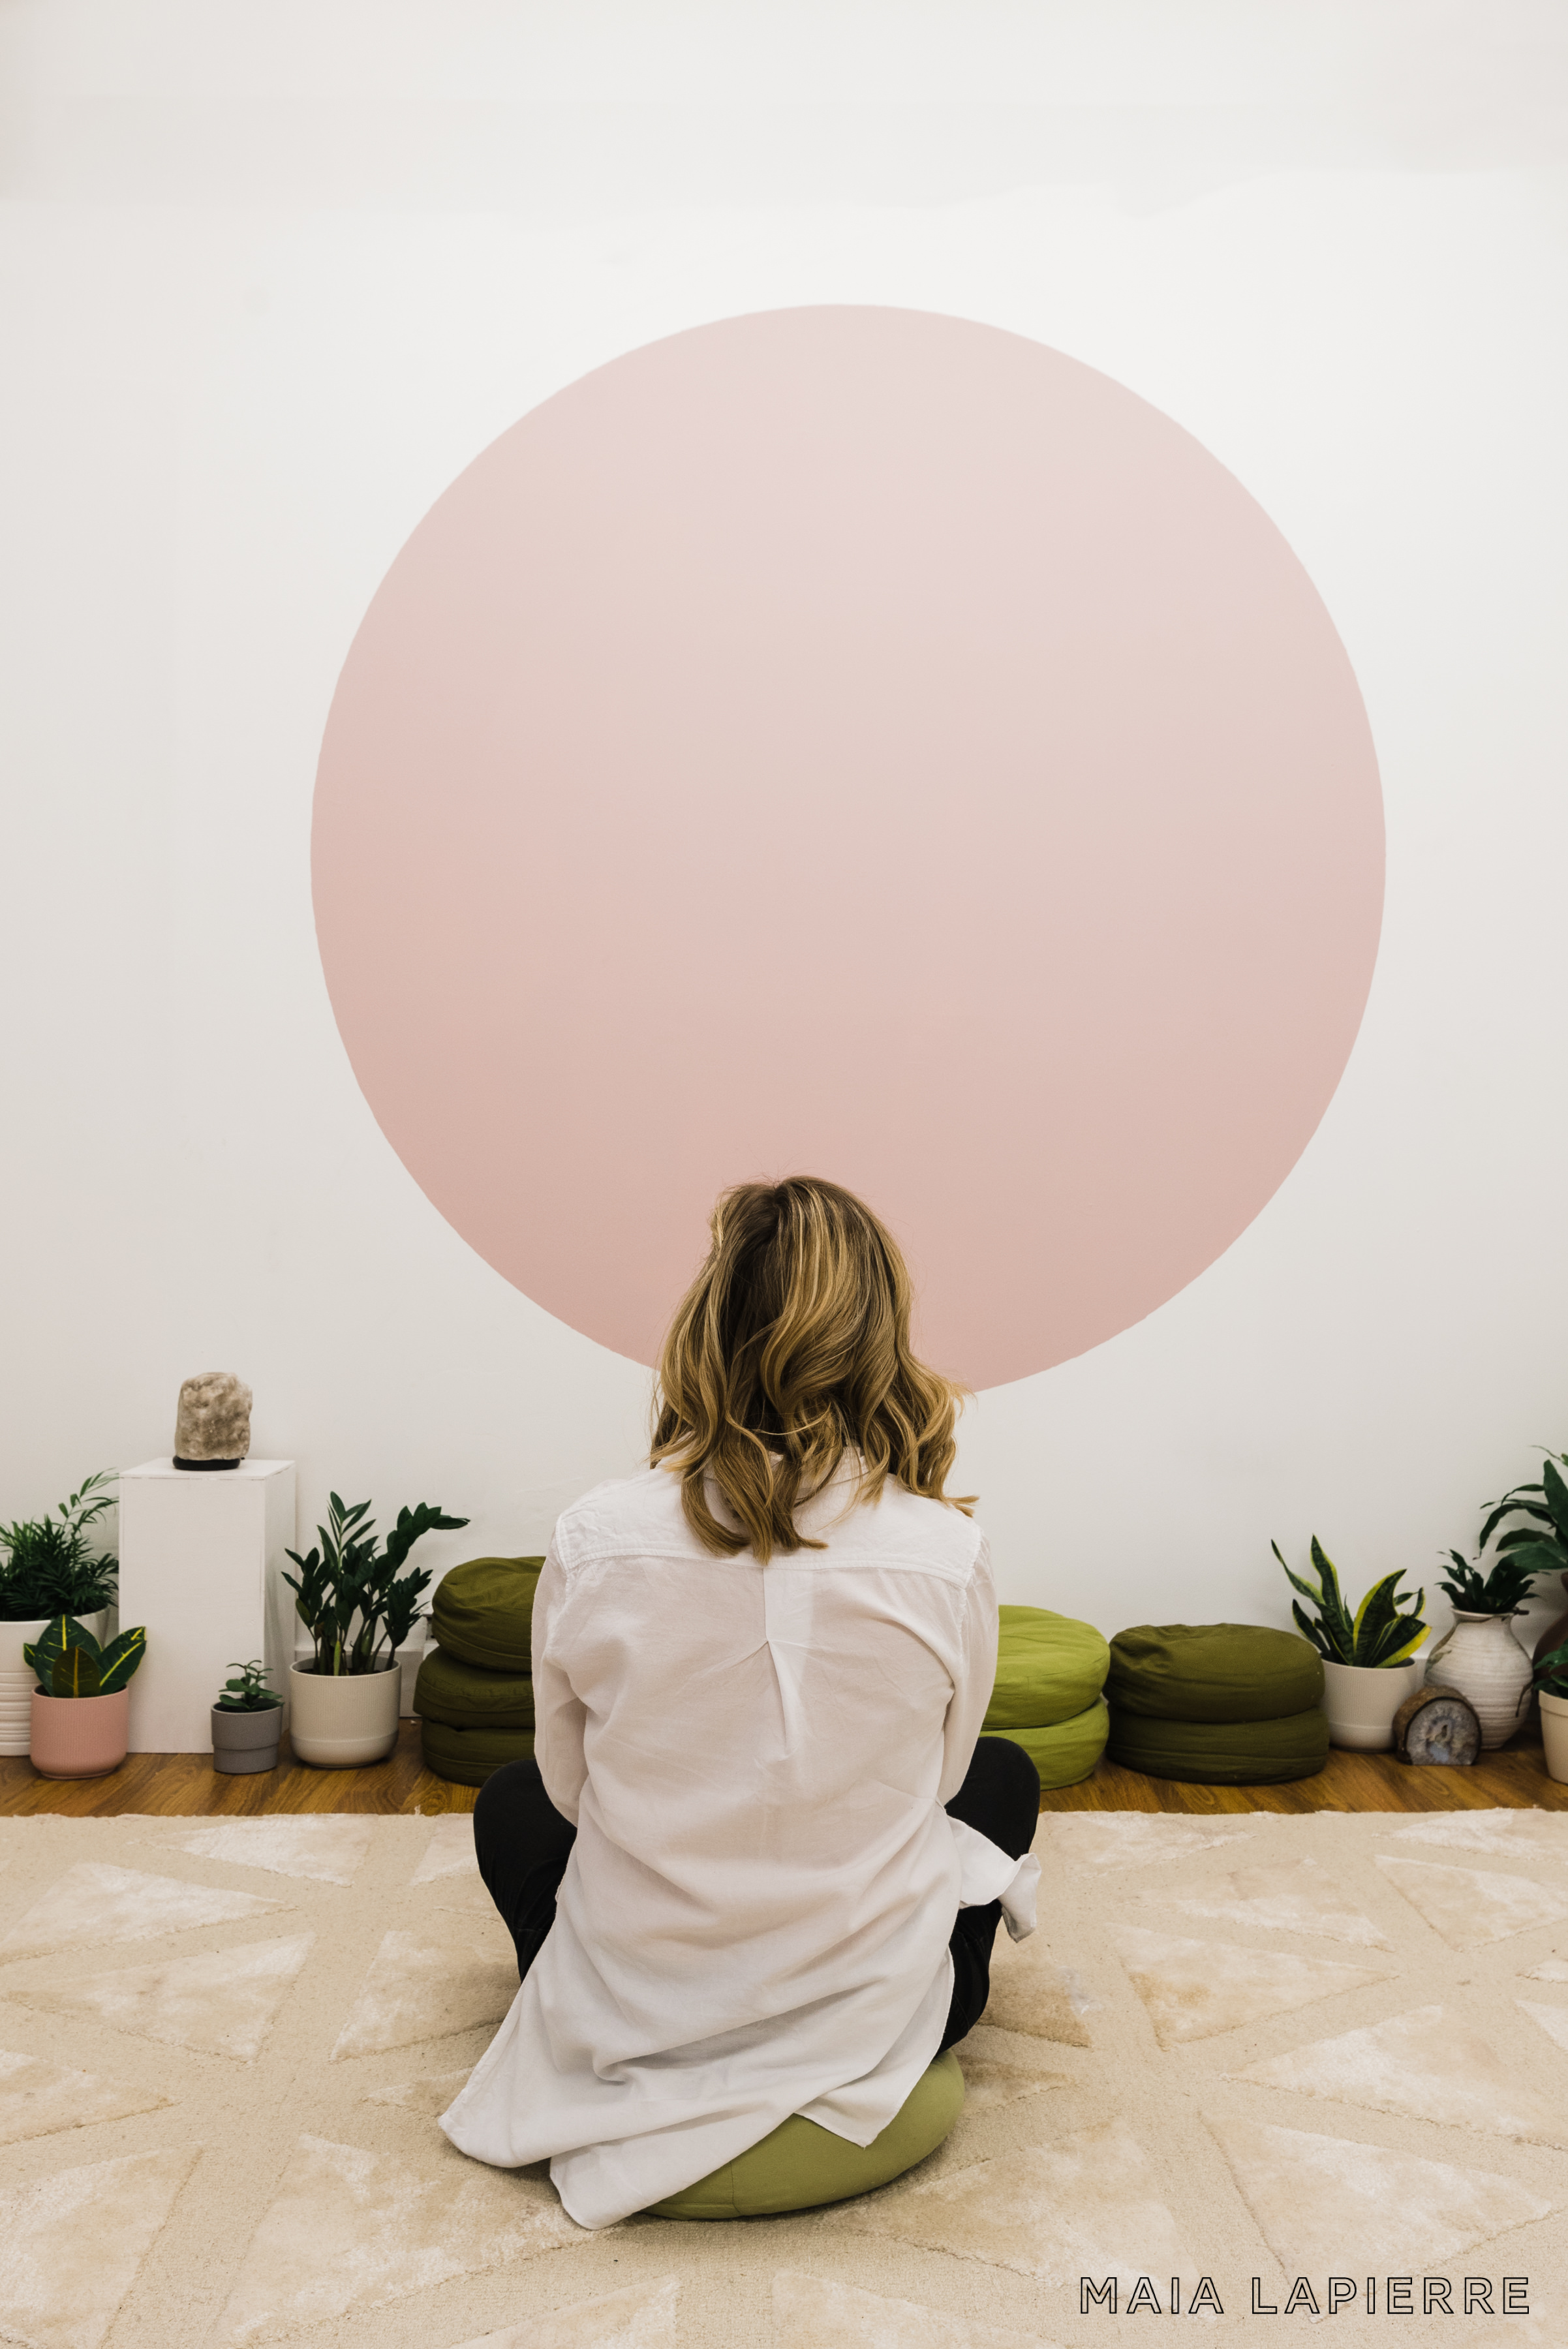 Maia LaPierre Interiors - Flo Meditation StudioMaia LaPierre Interiors - Flo Meditation Studio